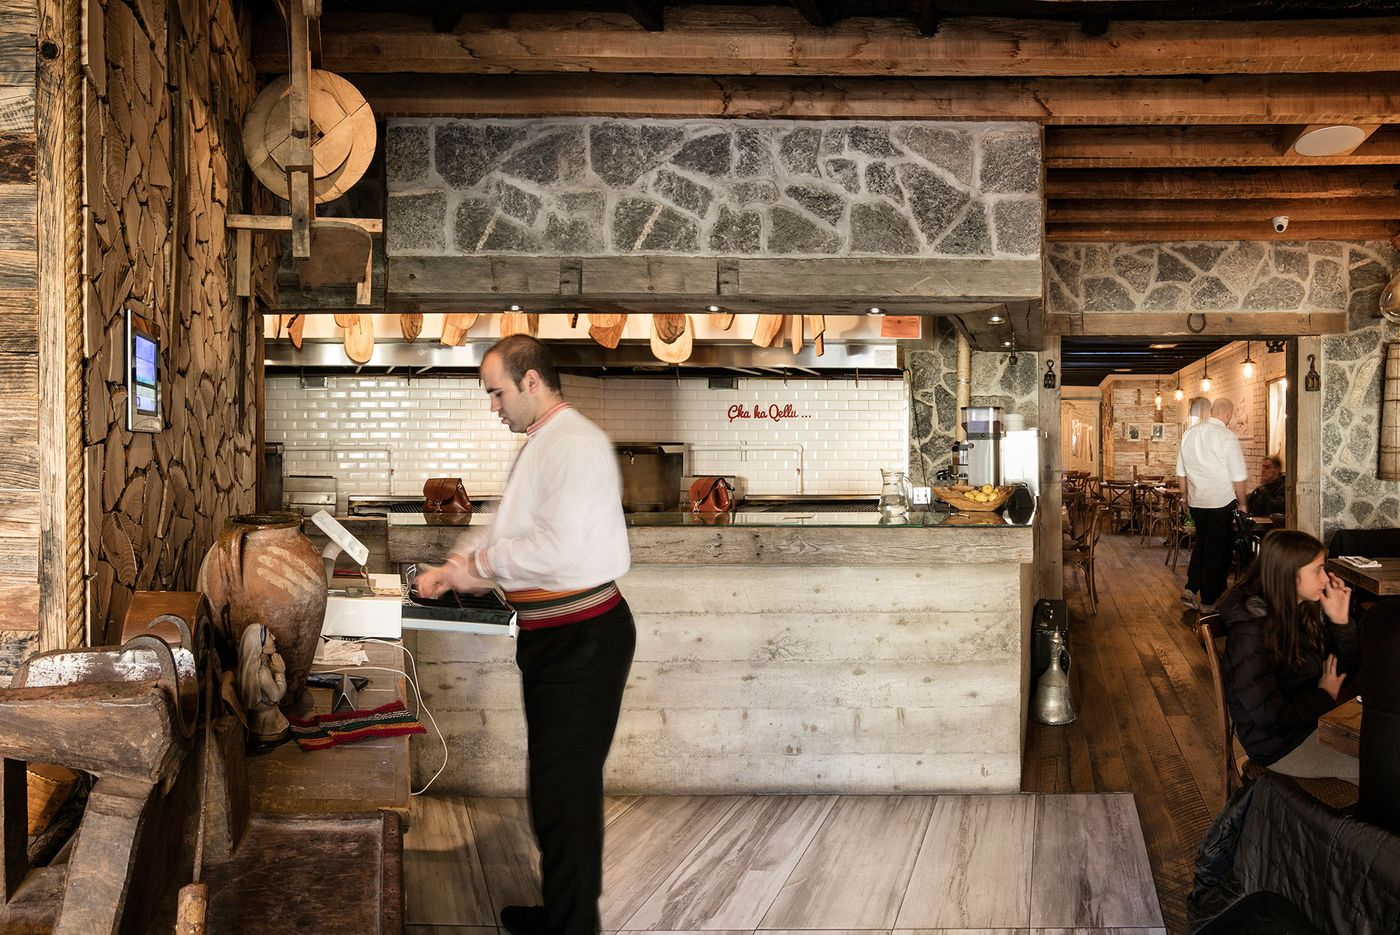 Çka Ka Qëllu: NYC Restaurant Review